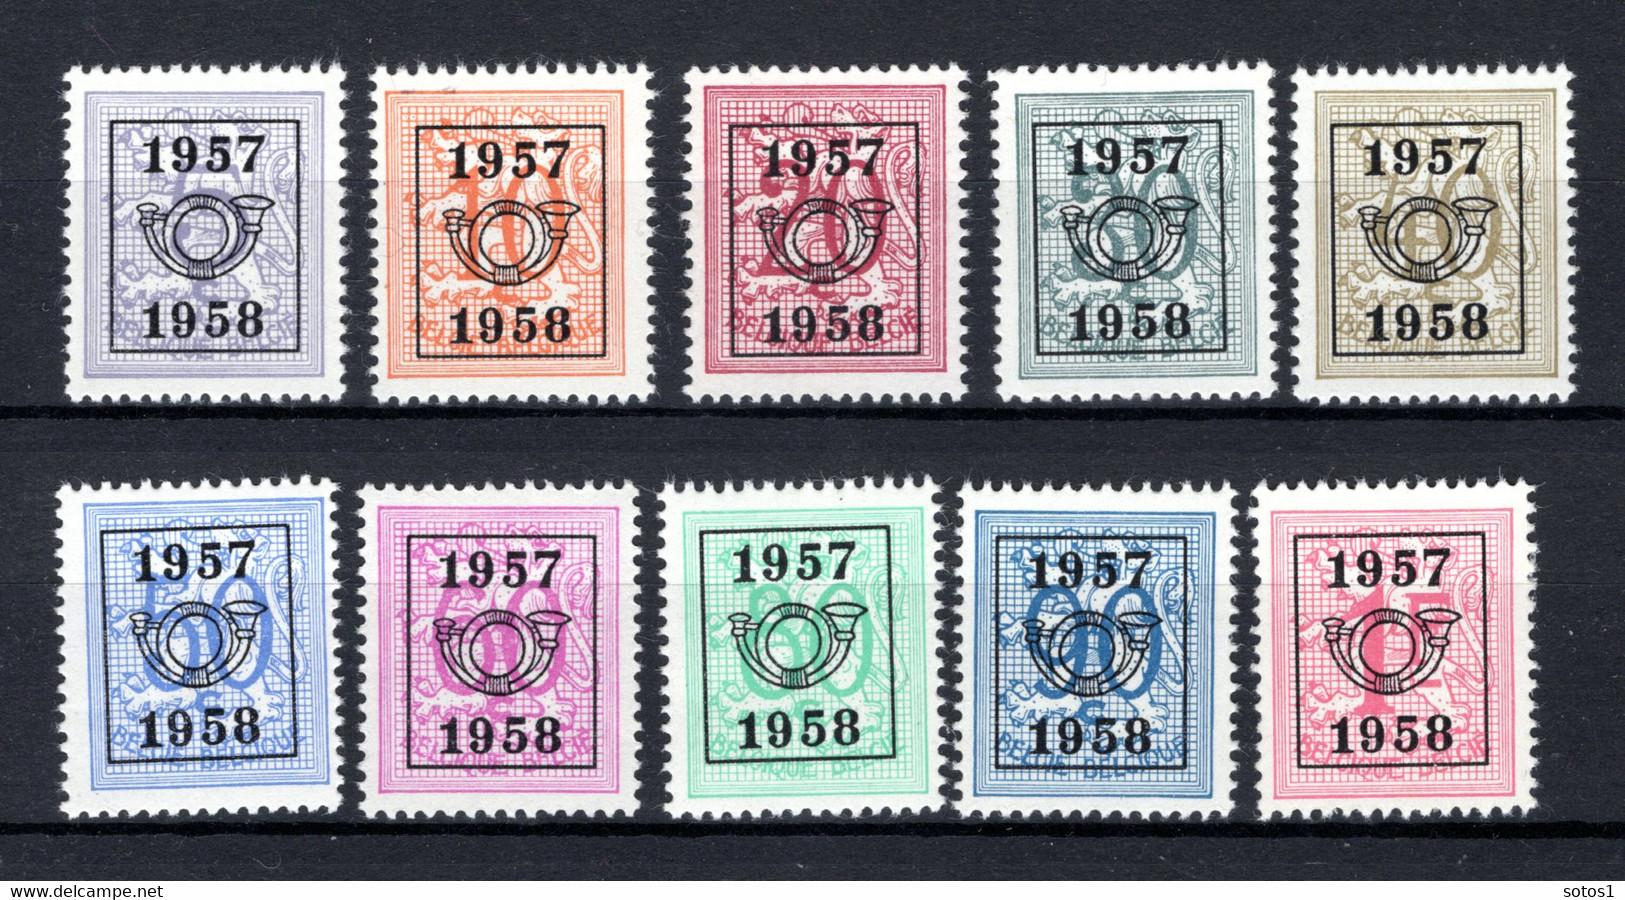 PRE666/675 MNH** 1957 - Cijfer Op Heraldieke Leeuw Type E - REEKS 50 - Sobreimpresos 1951-80 (Chifras Sobre El Leon)